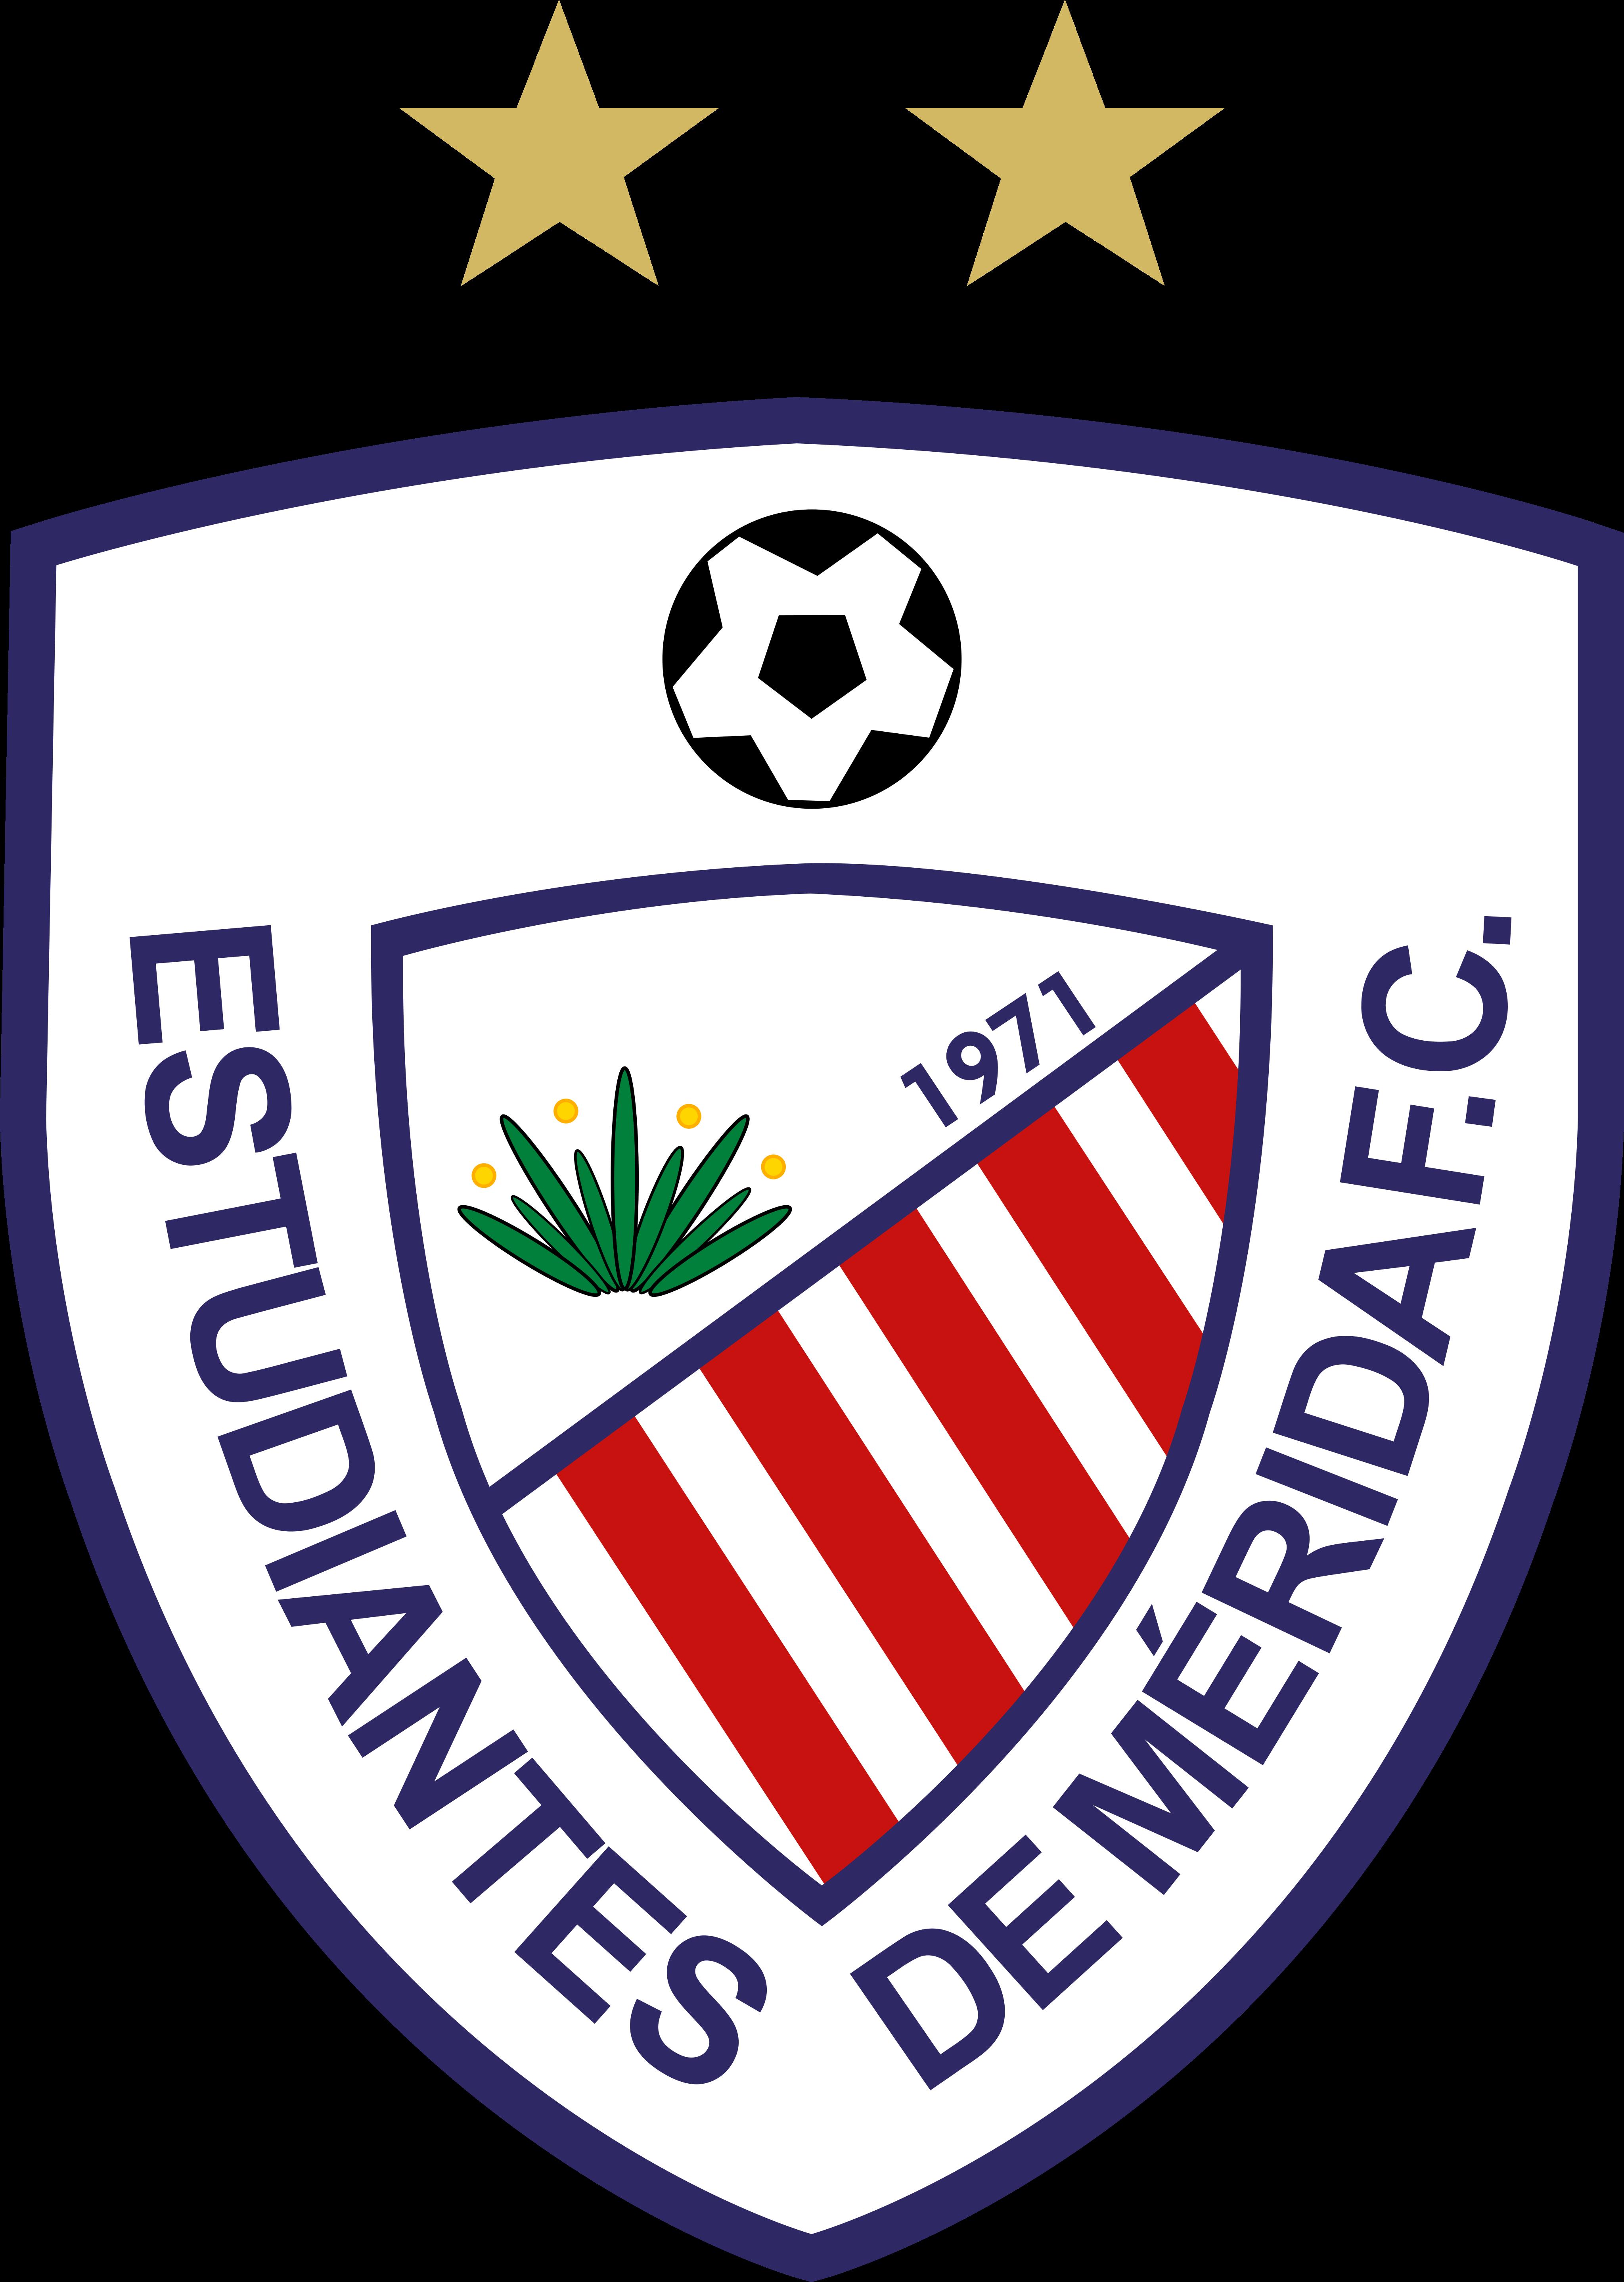 estudiantes de merida logo 1 - Estudiantes de Mérida Logo